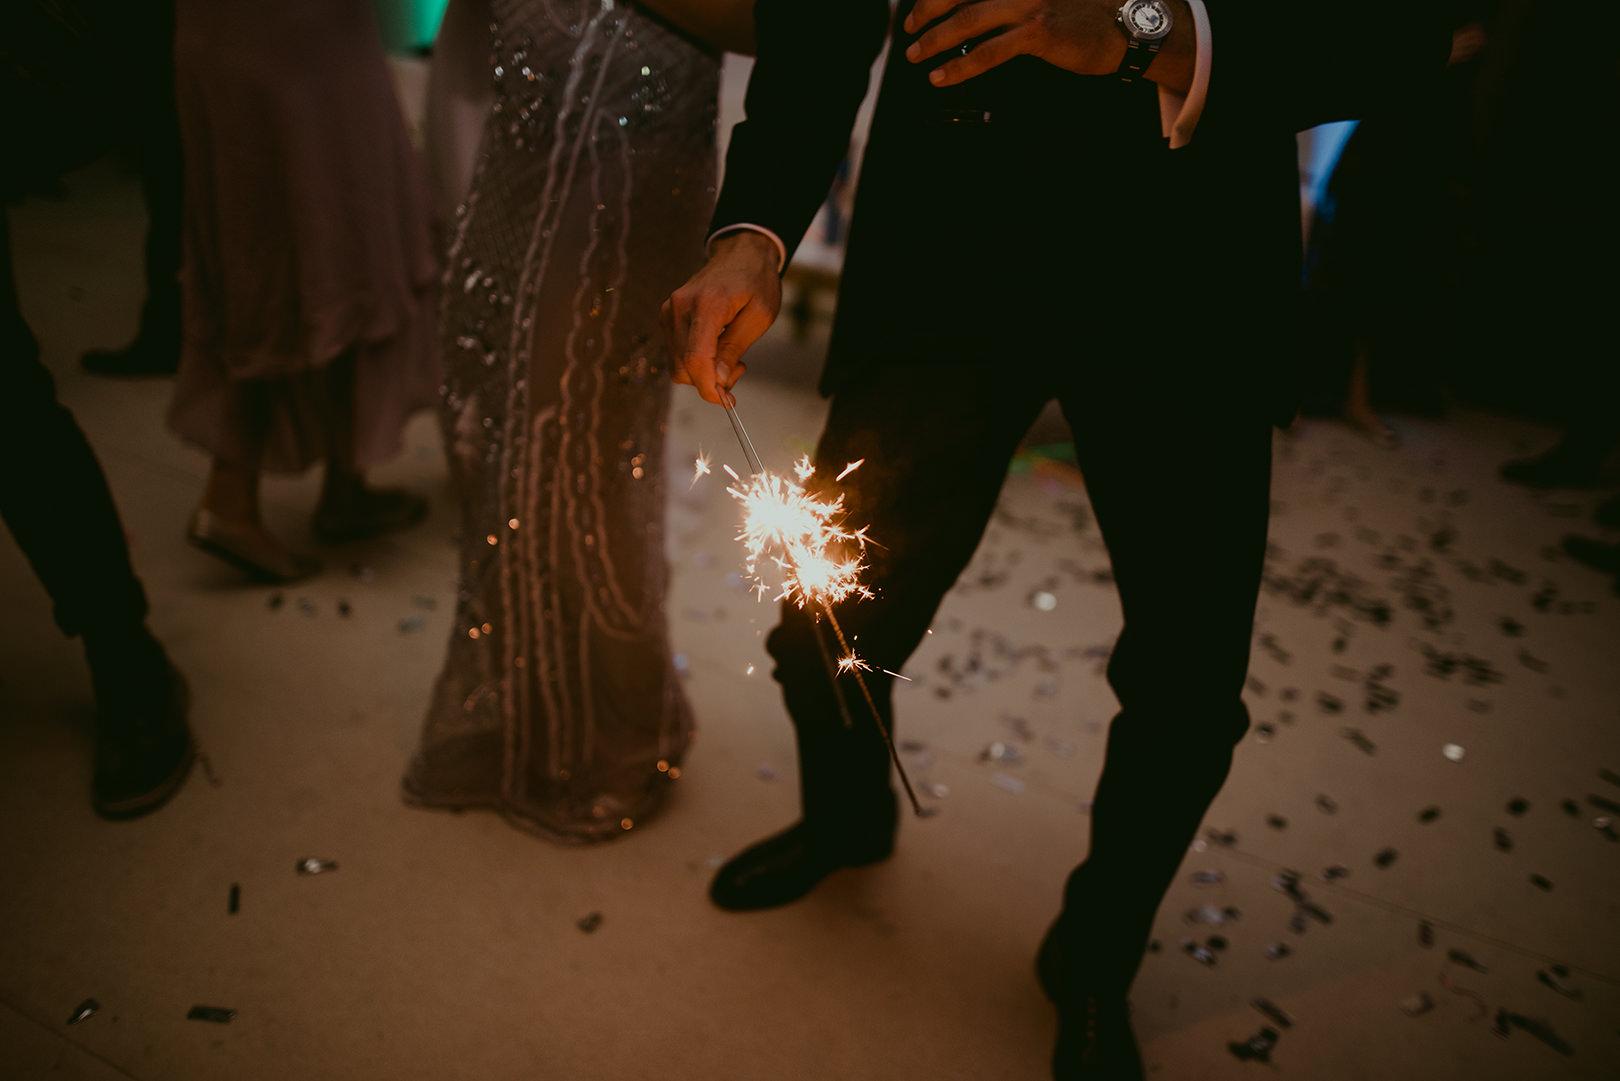 Fun wedding photography at Chateau de la Napoule in Cannes